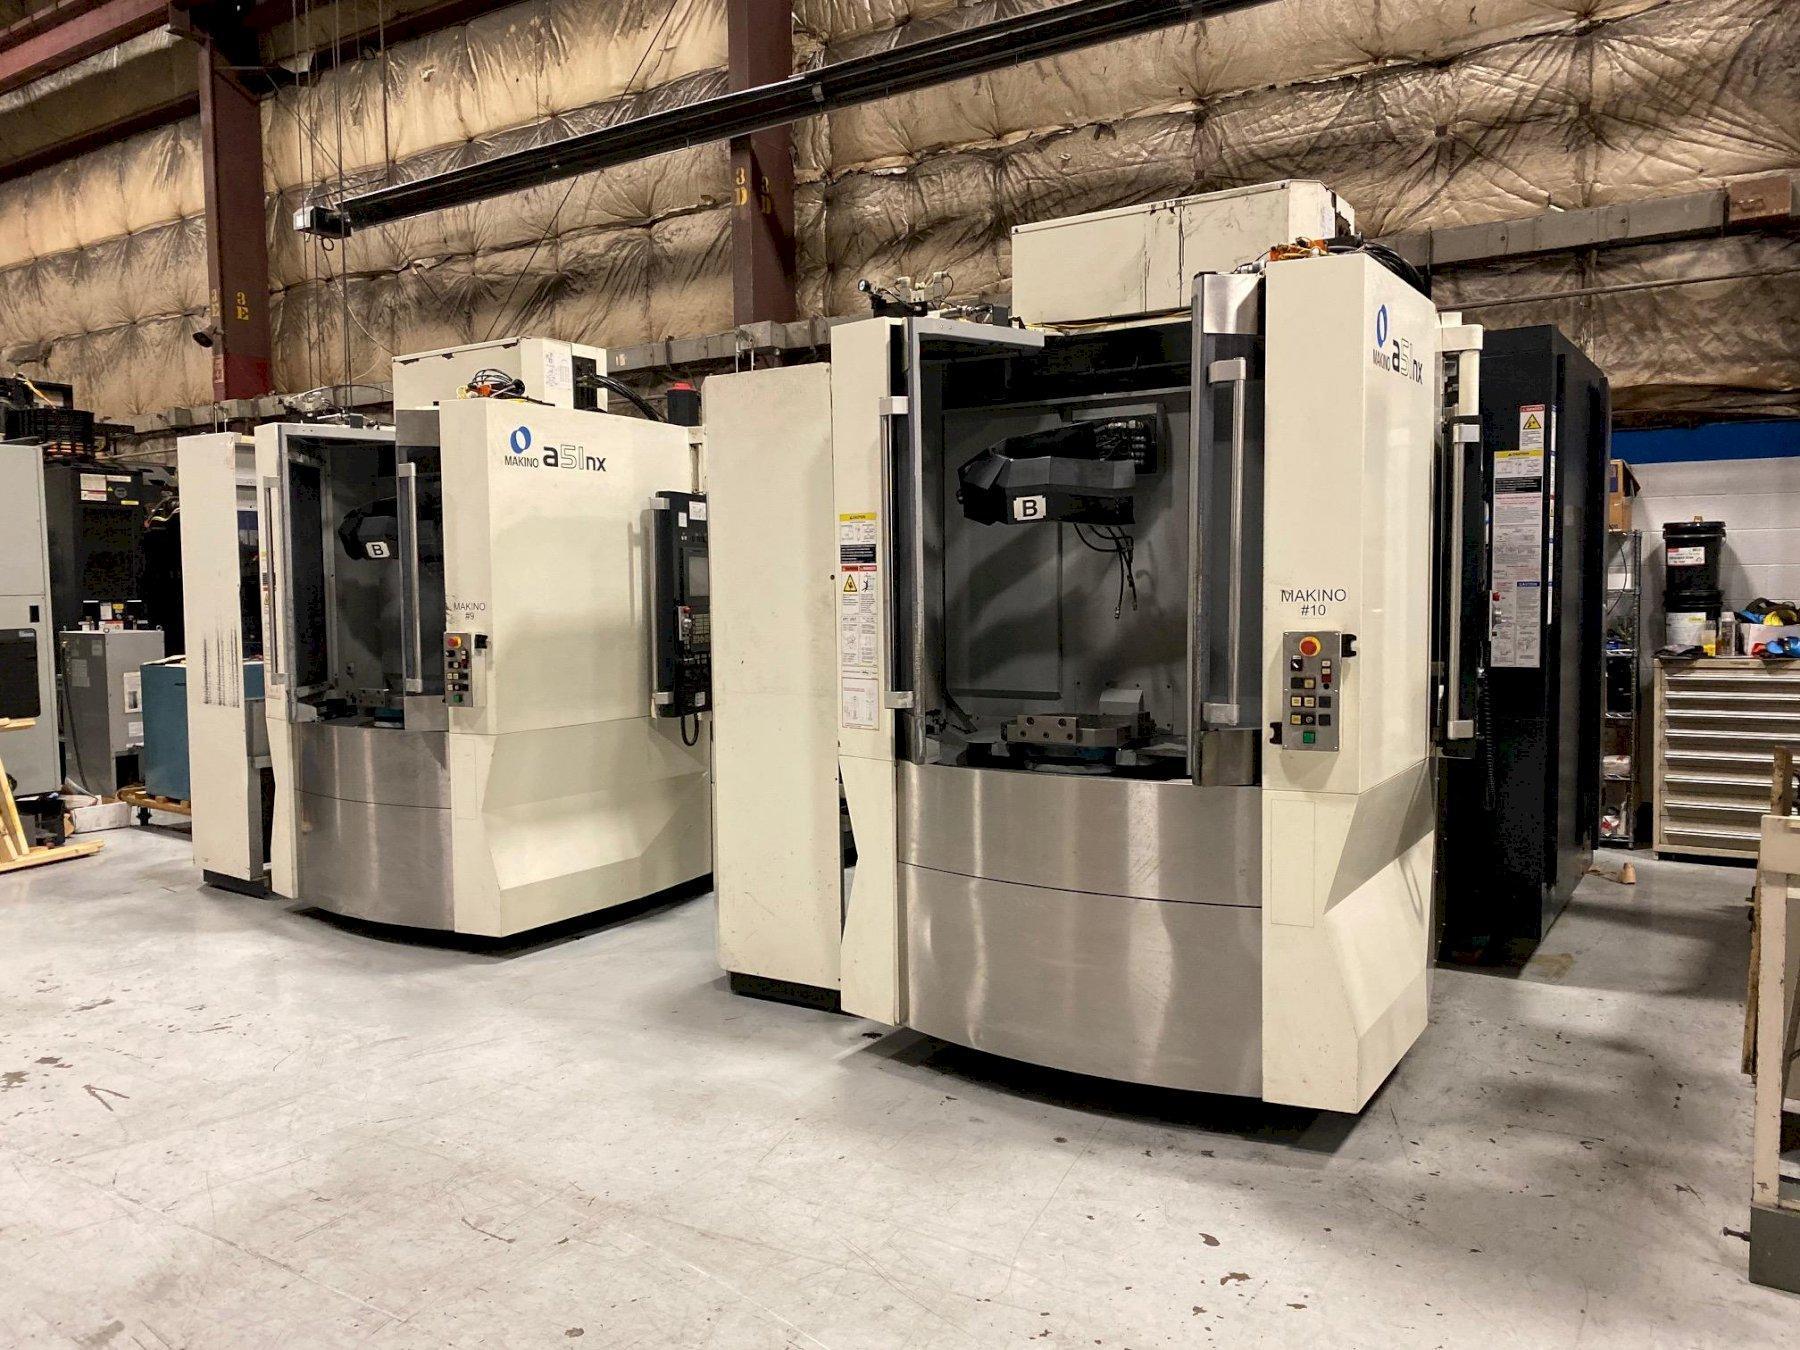 2013 Makino A51NX - CNC Horizontal Machining Center